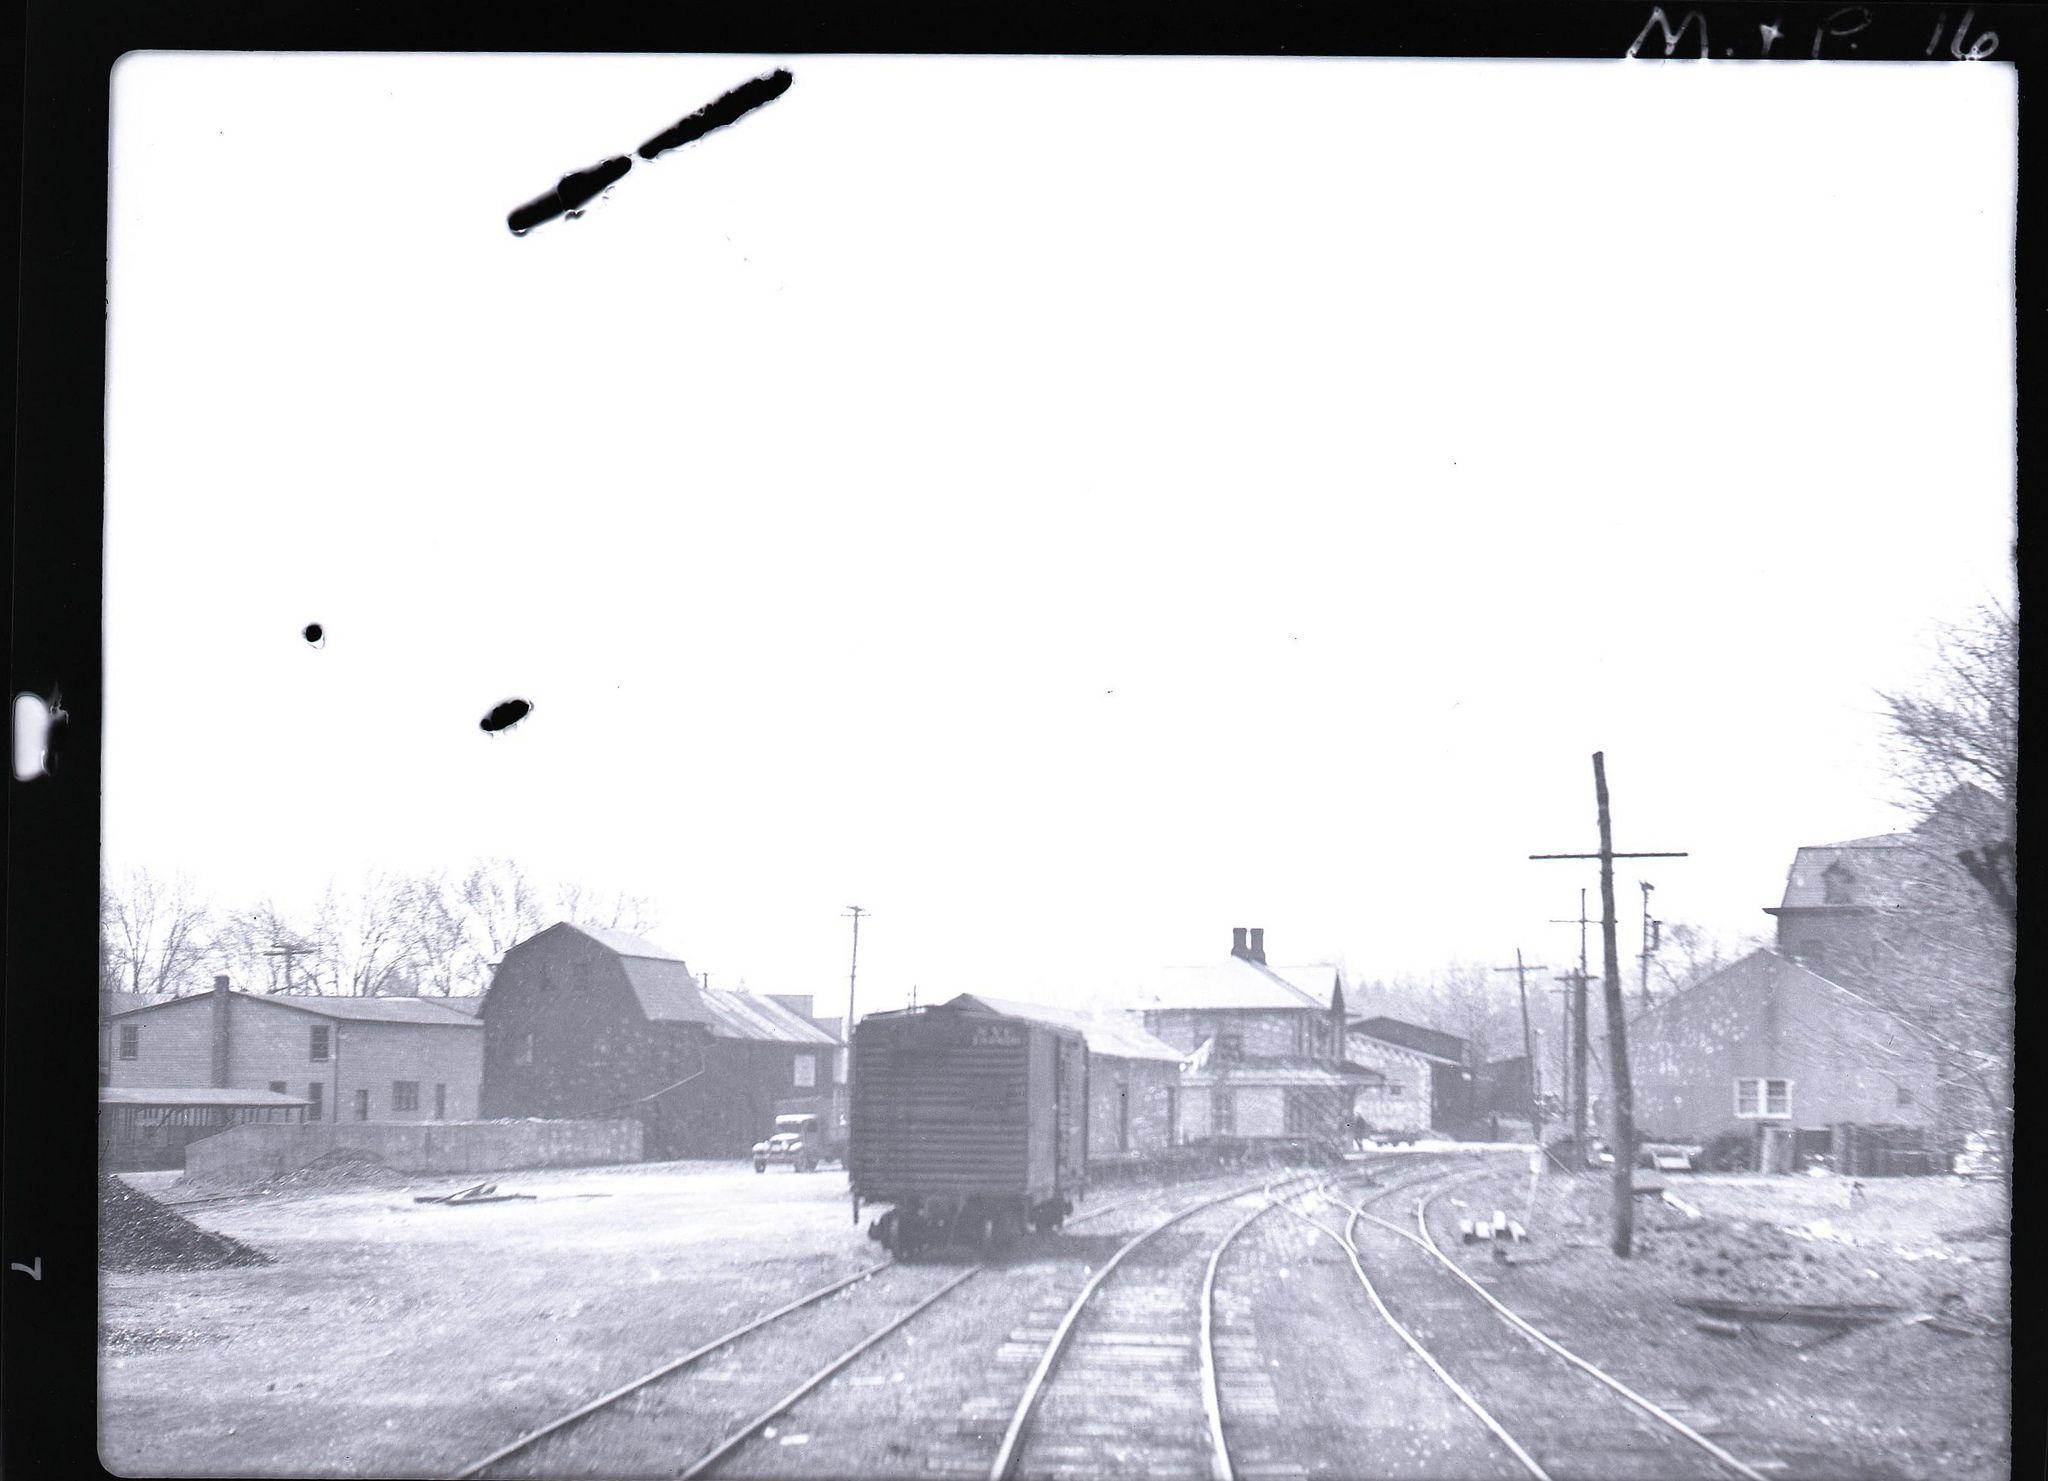 ma pa016 Railroad pictures, Pennsylvania railroad, Bel air